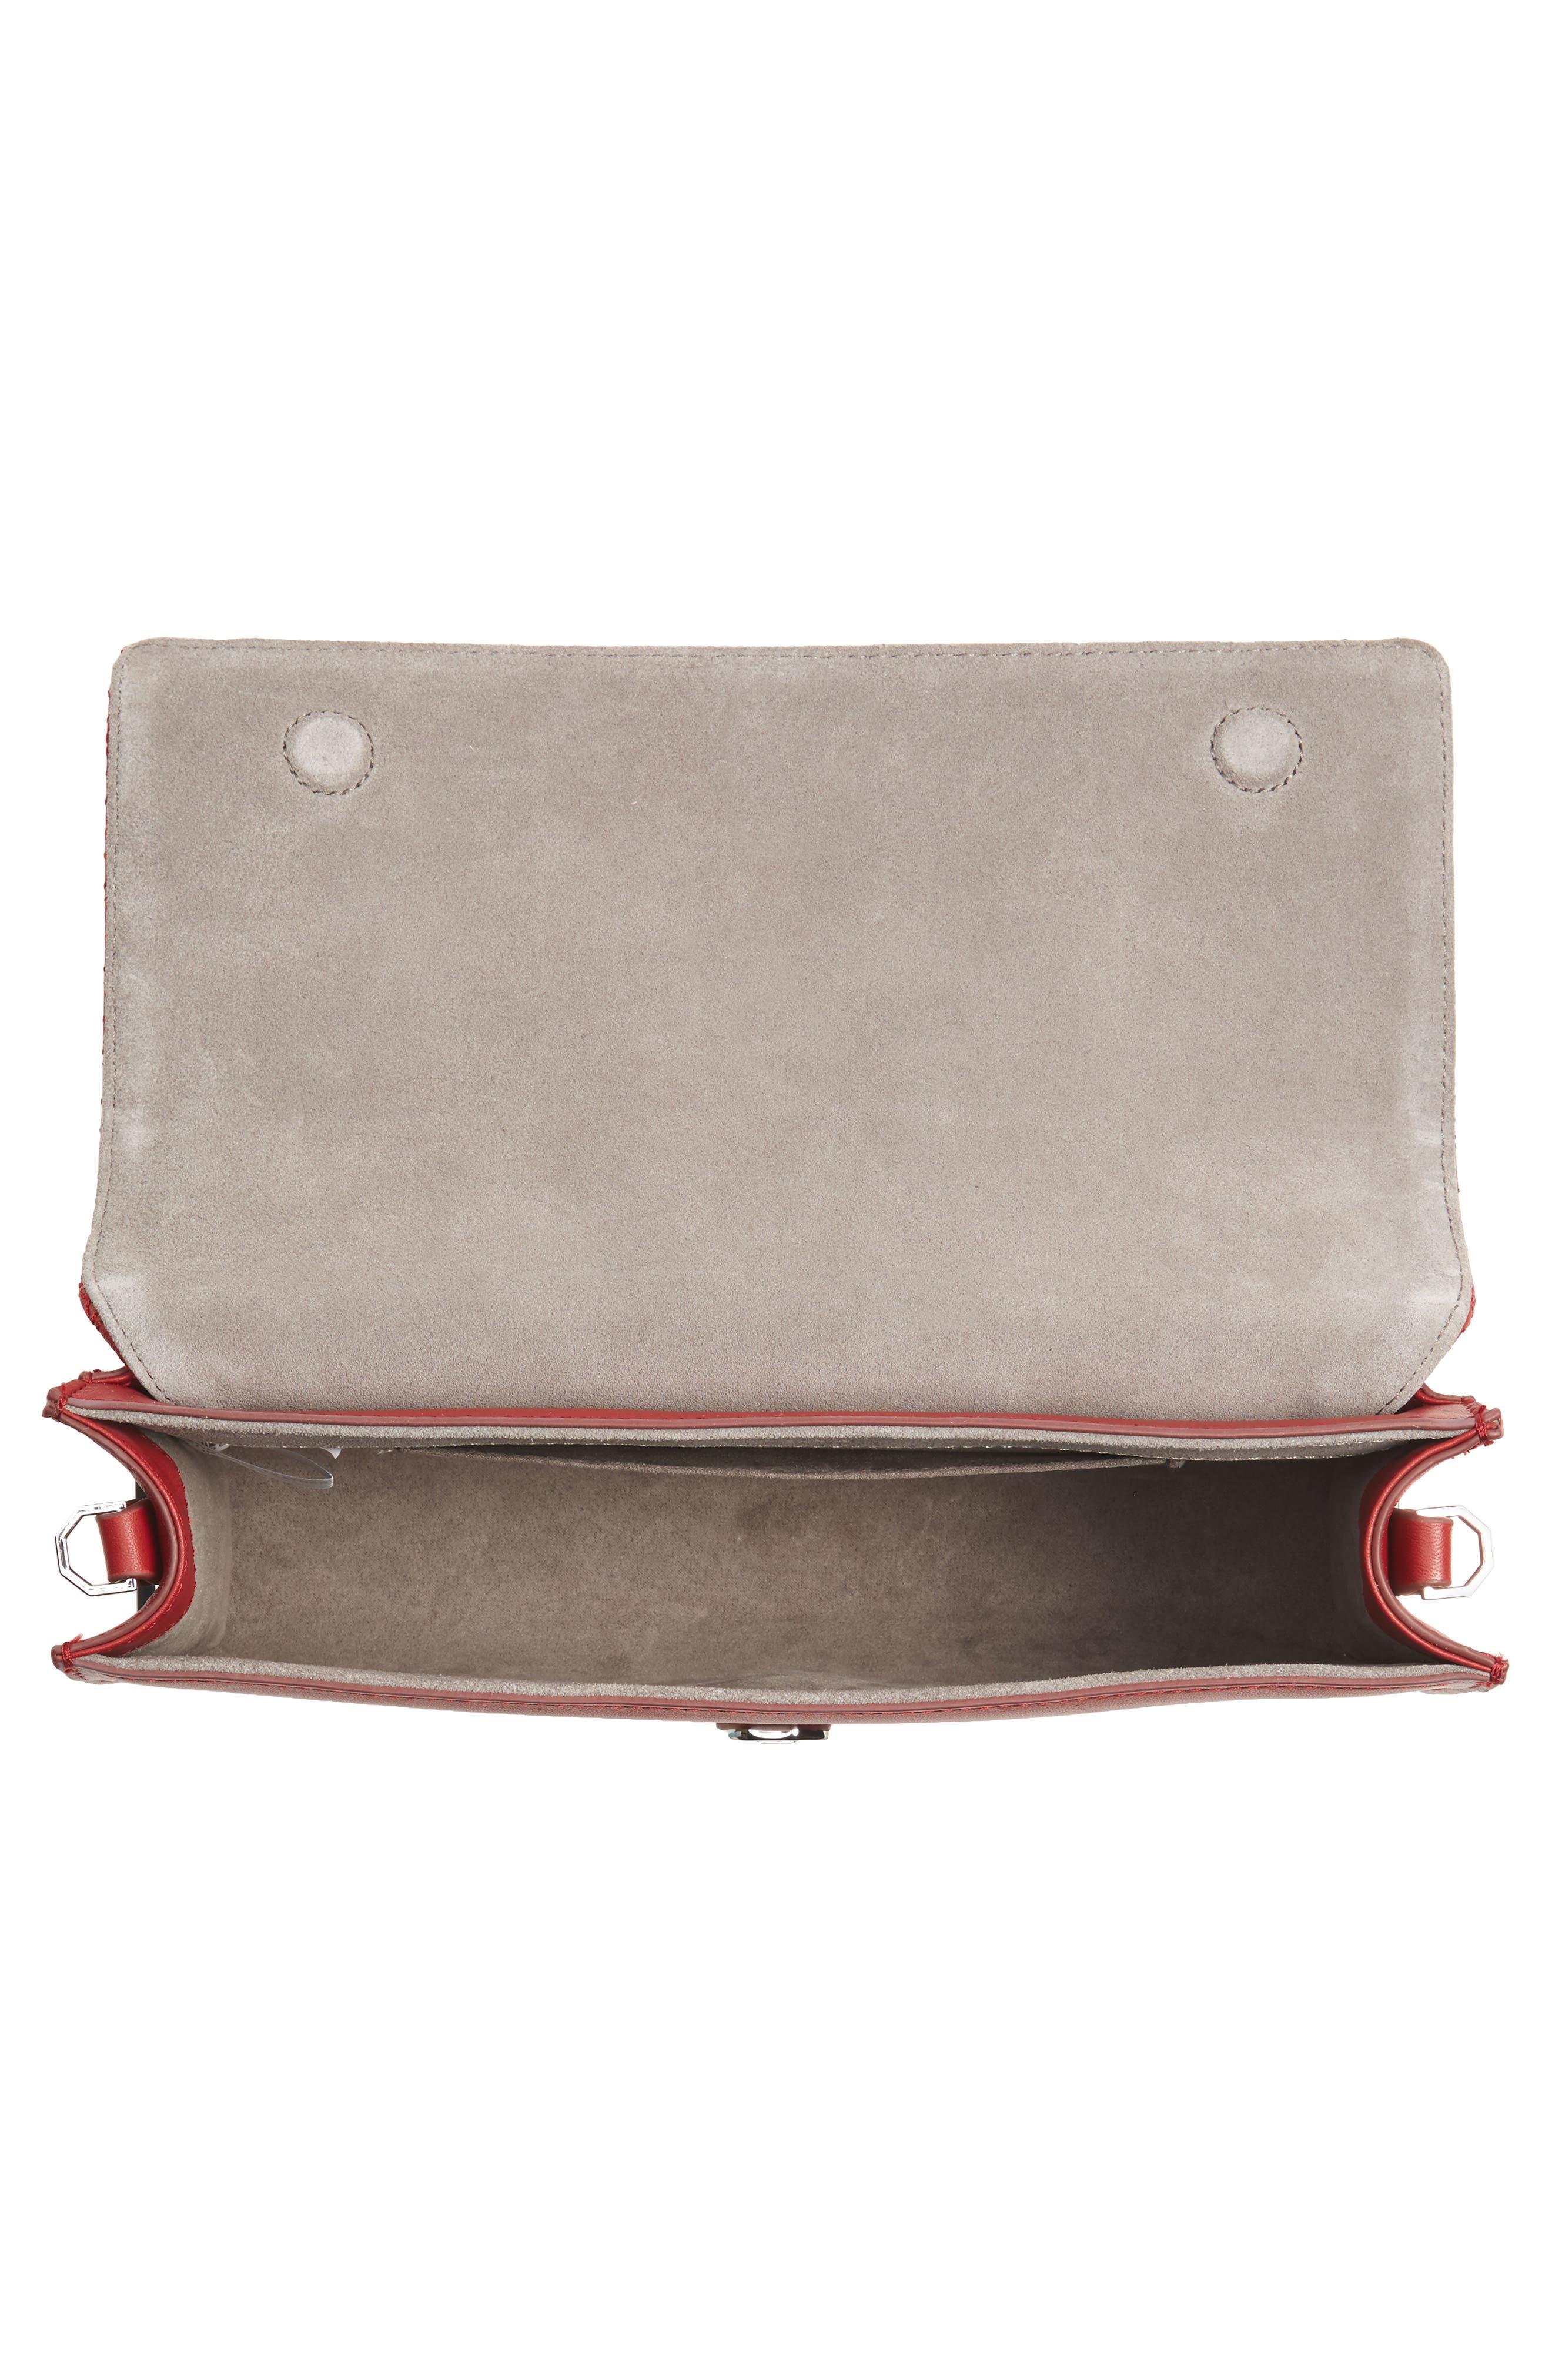 'Yvet' Leather Flap Clutch,                             Alternate thumbnail 10, color,